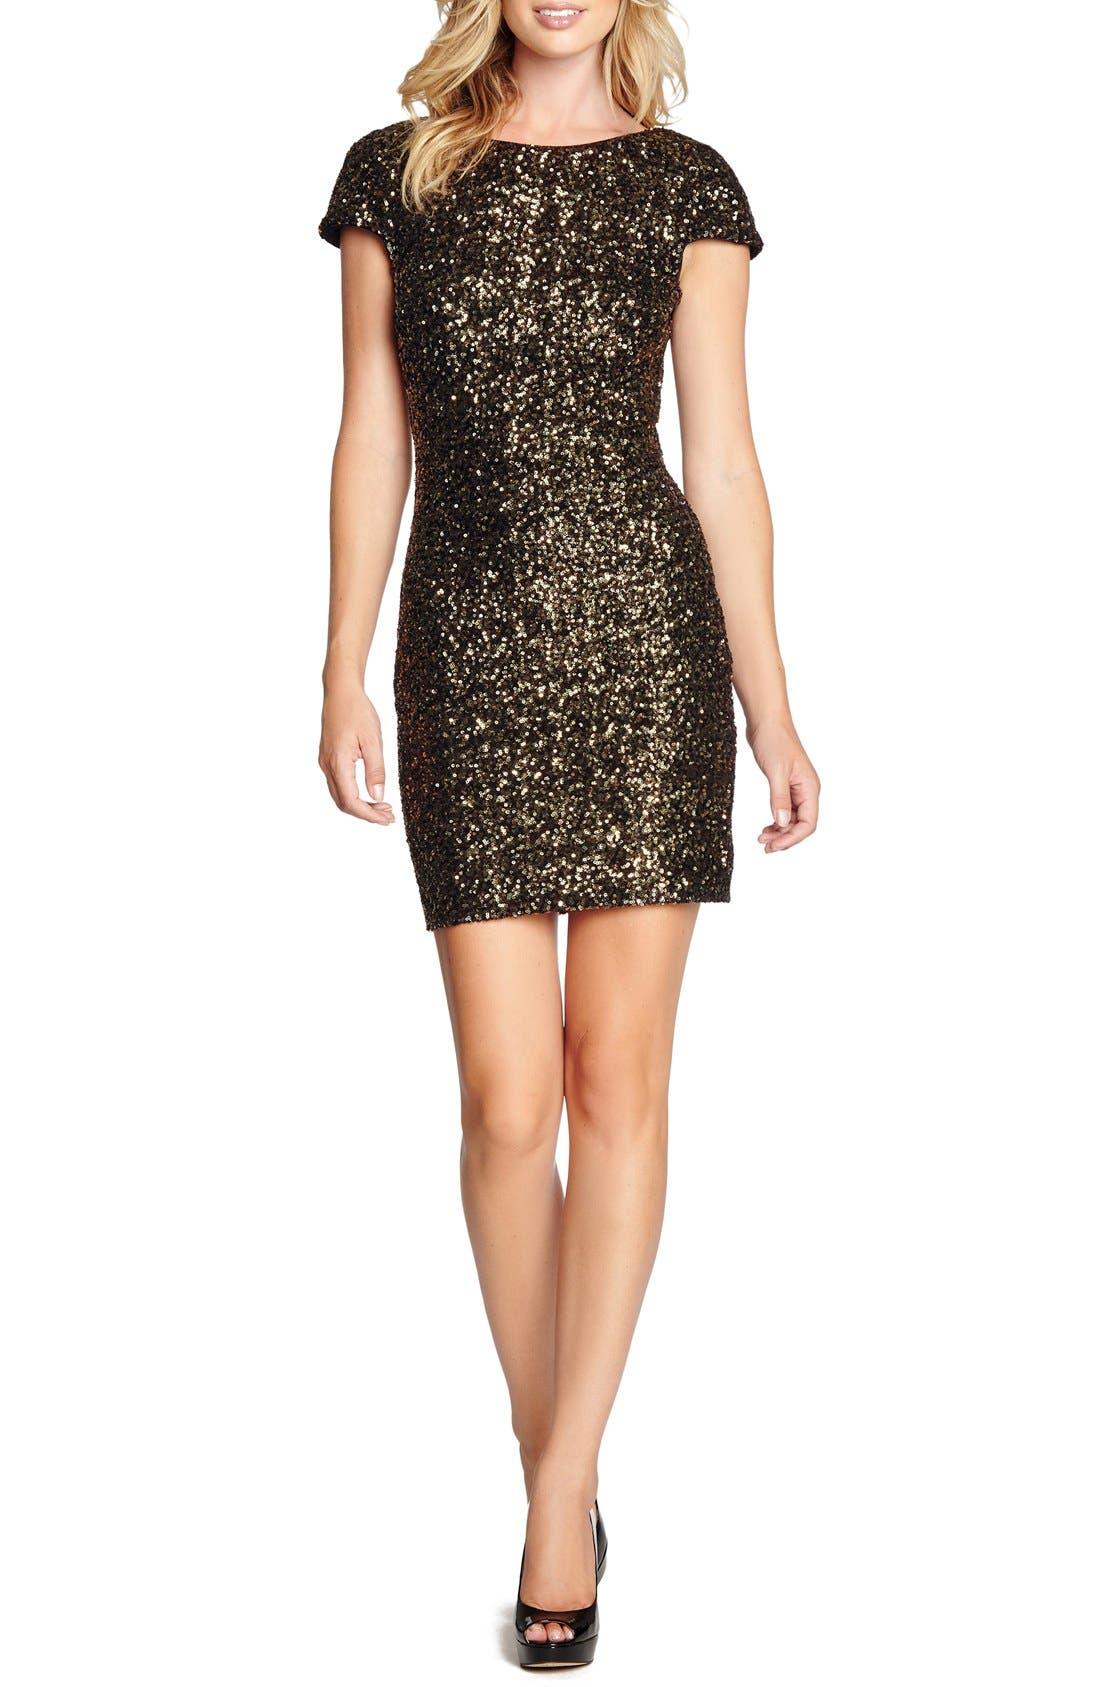 Alternate Image 1 Selected - Dress the Population Tabitha Sequin Minidress